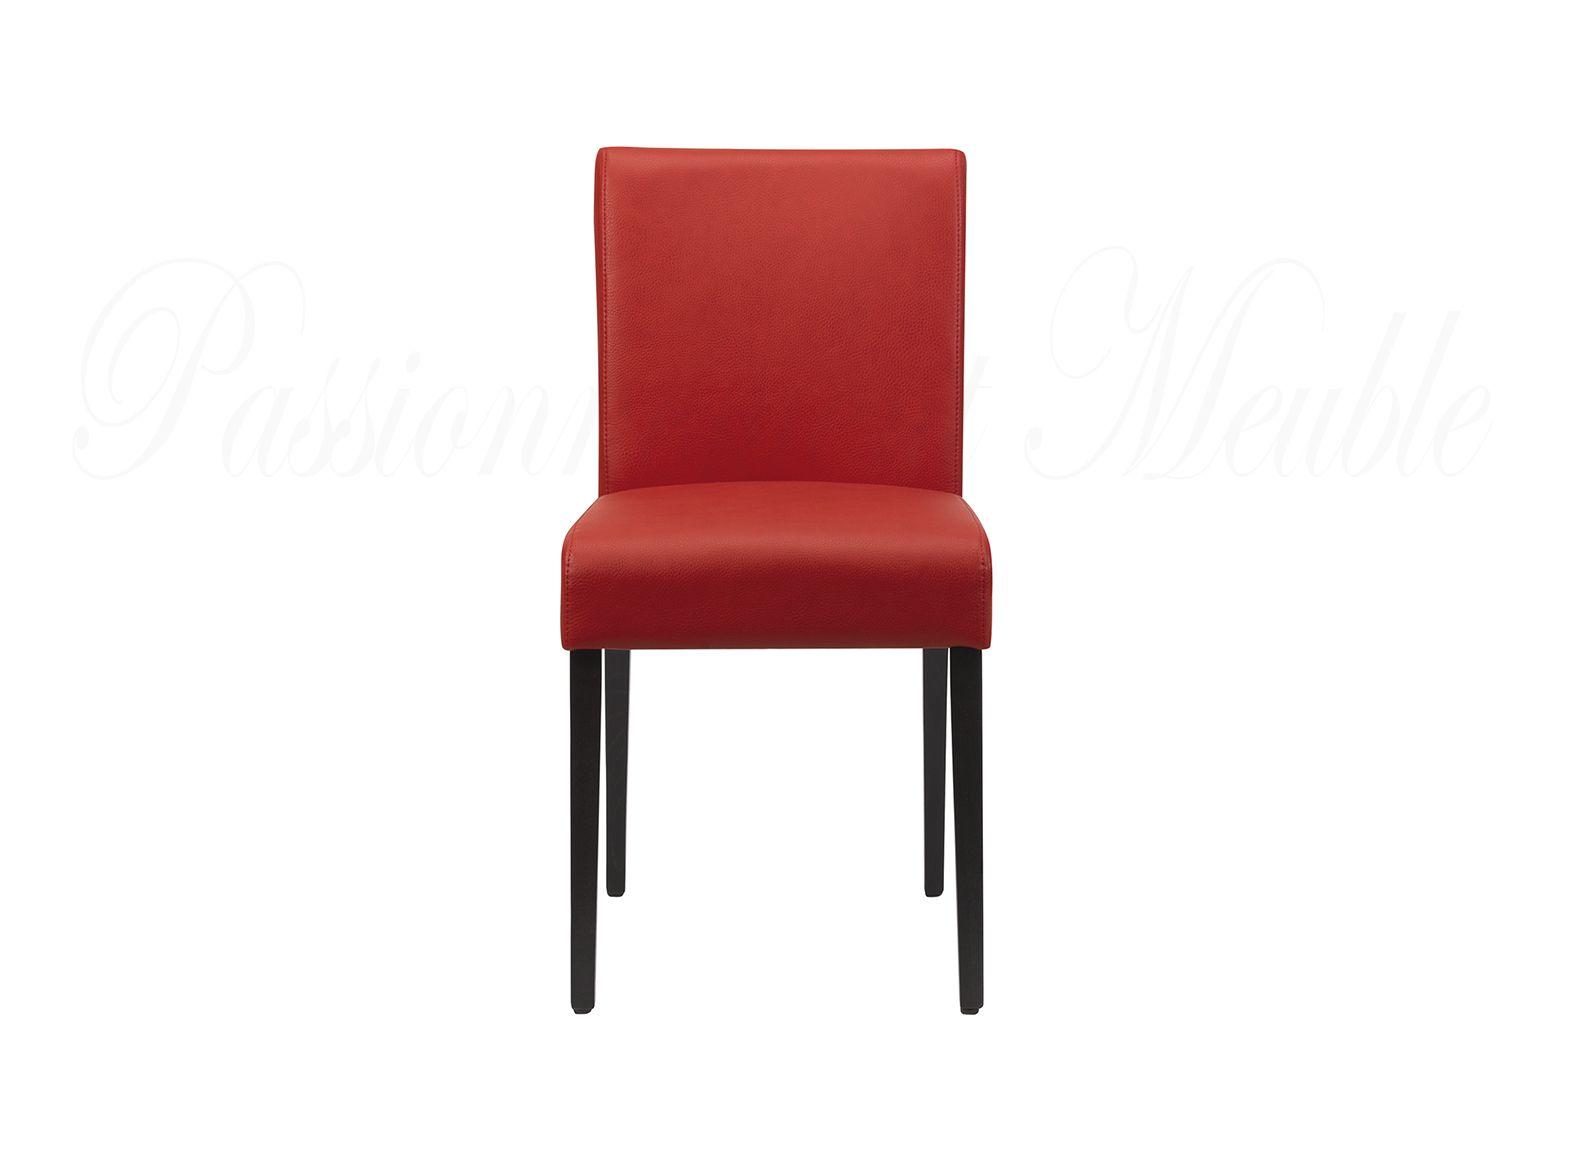 chaise de repas mobitec shanna. Black Bedroom Furniture Sets. Home Design Ideas